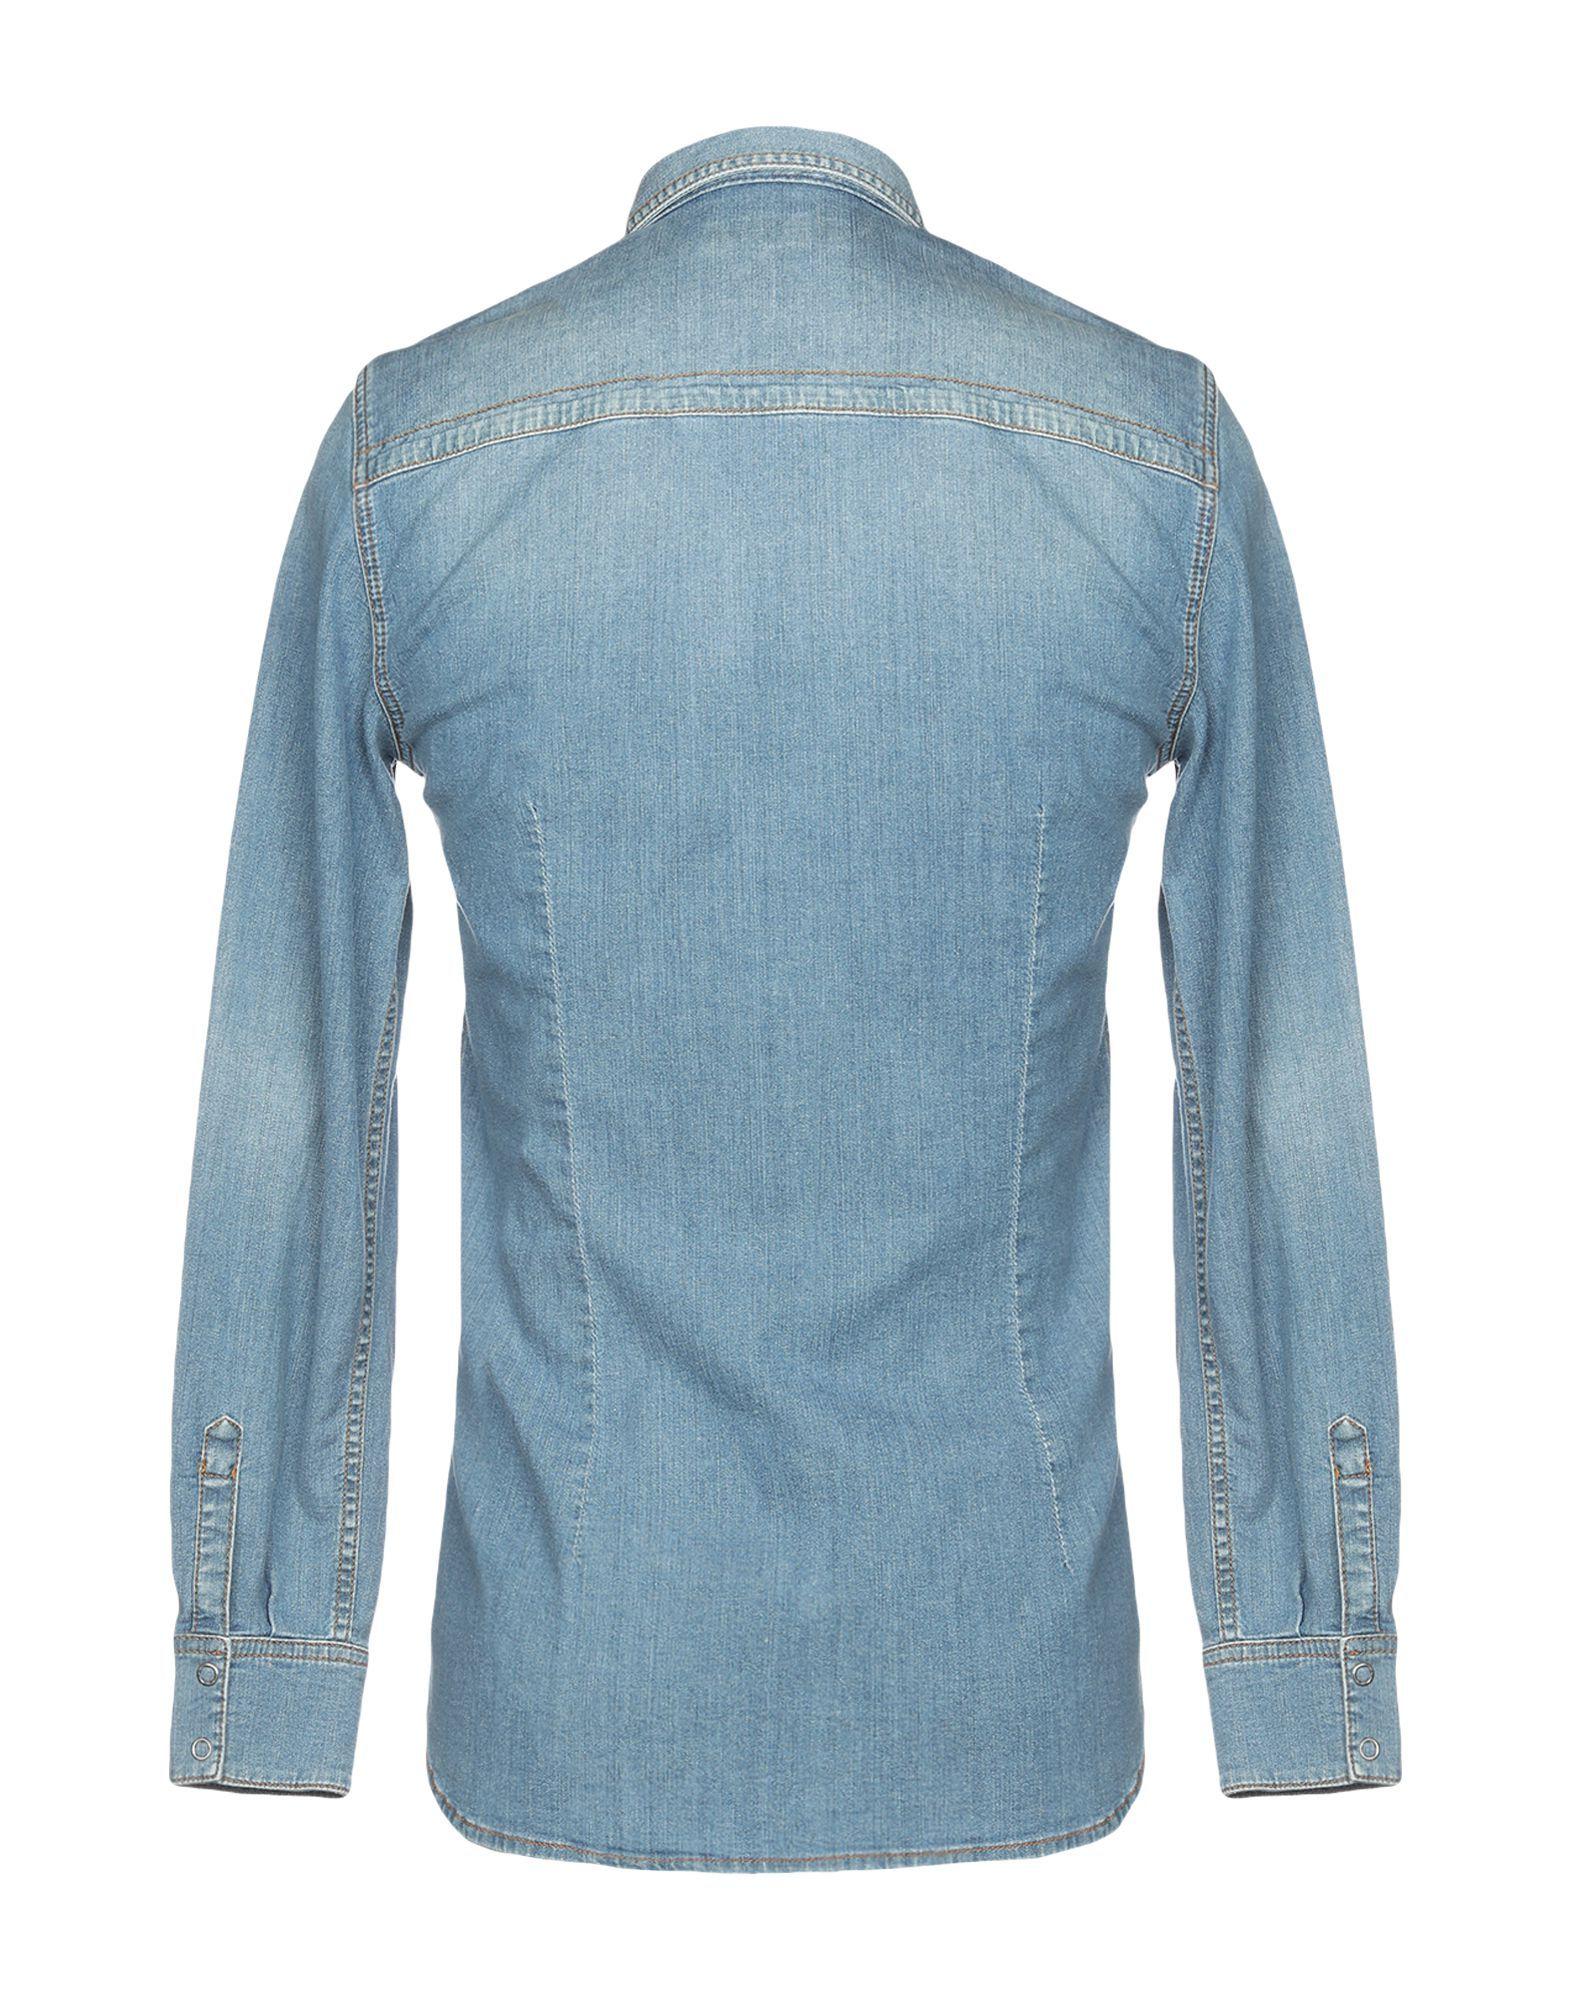 DENIM Bikkembergs Blue Man Cotton